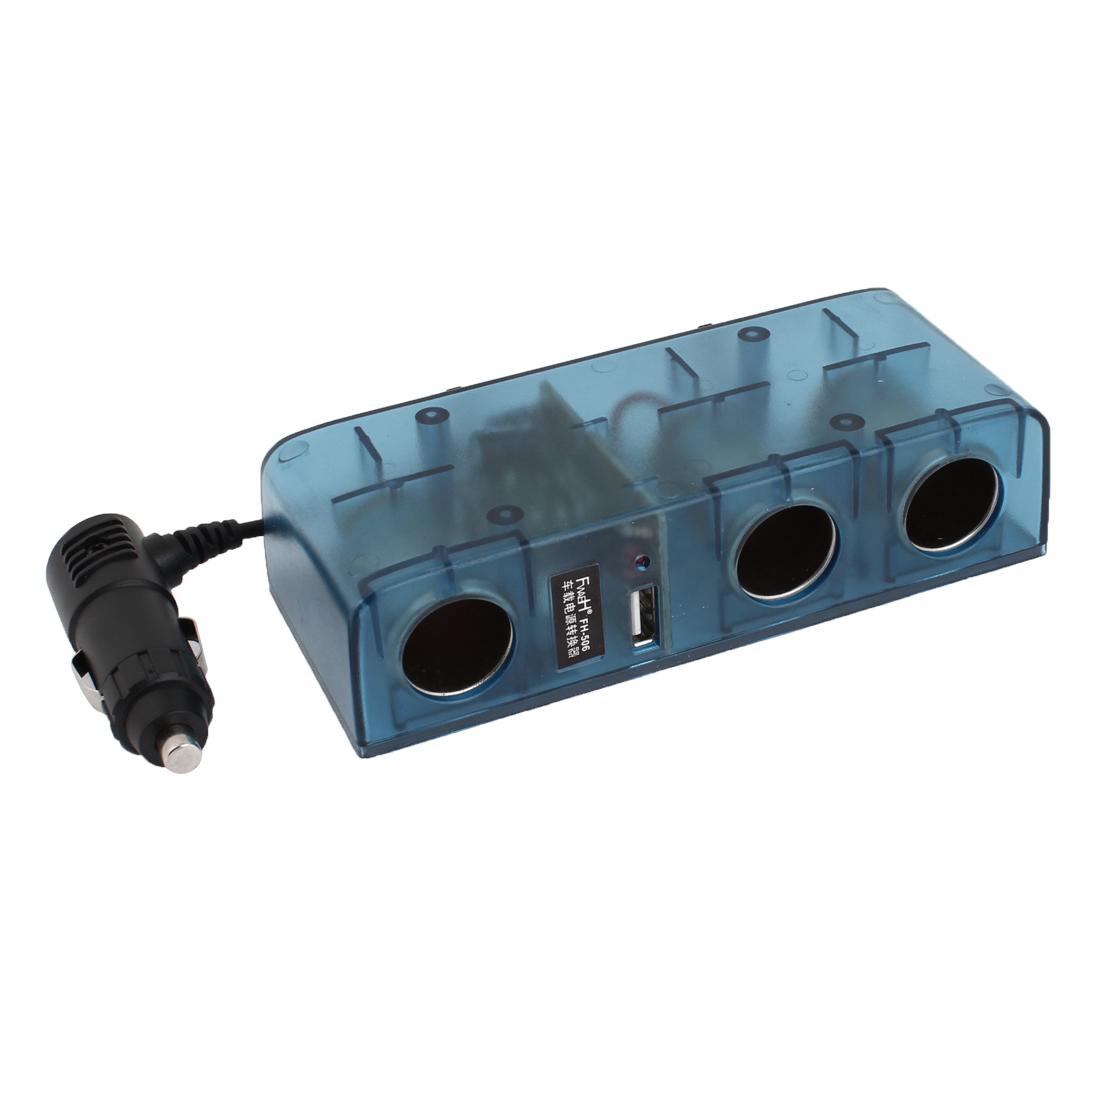 Clear Blue Shell DC 24V to 12V Car Power Supply Transformer Converter